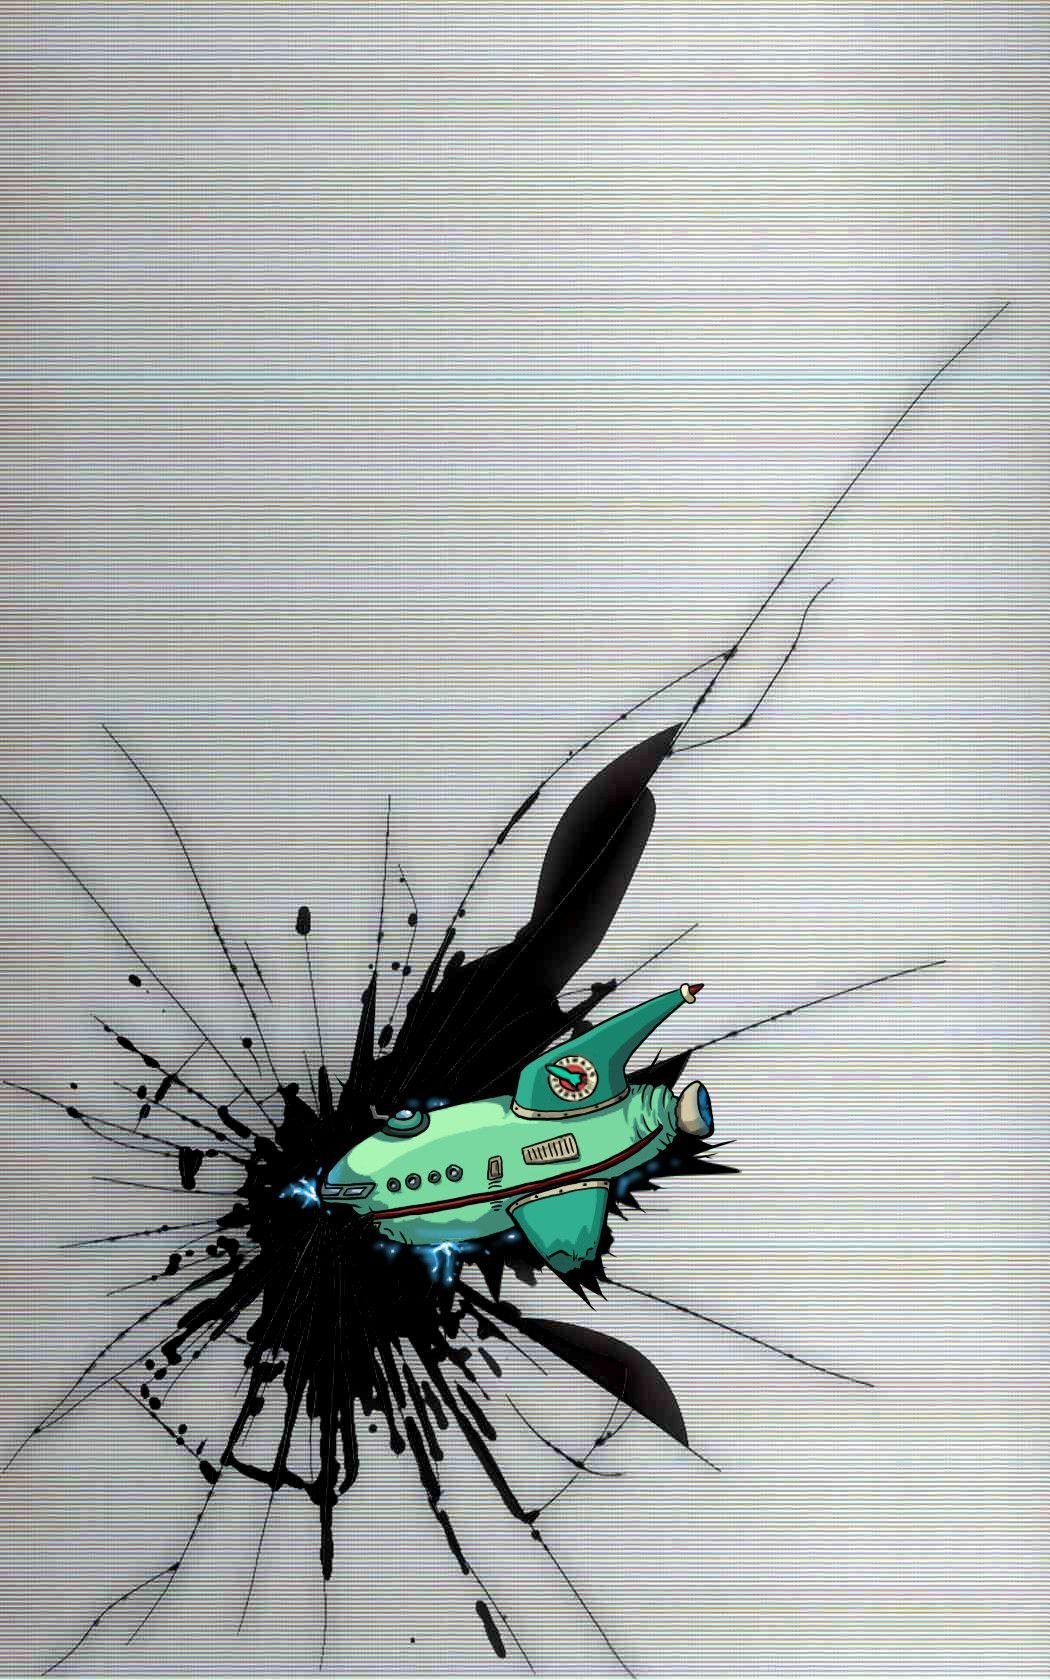 Pin By Jason Mical On Awesomeness Futurama Cartoon Wallpaper Iphone Wallpaper